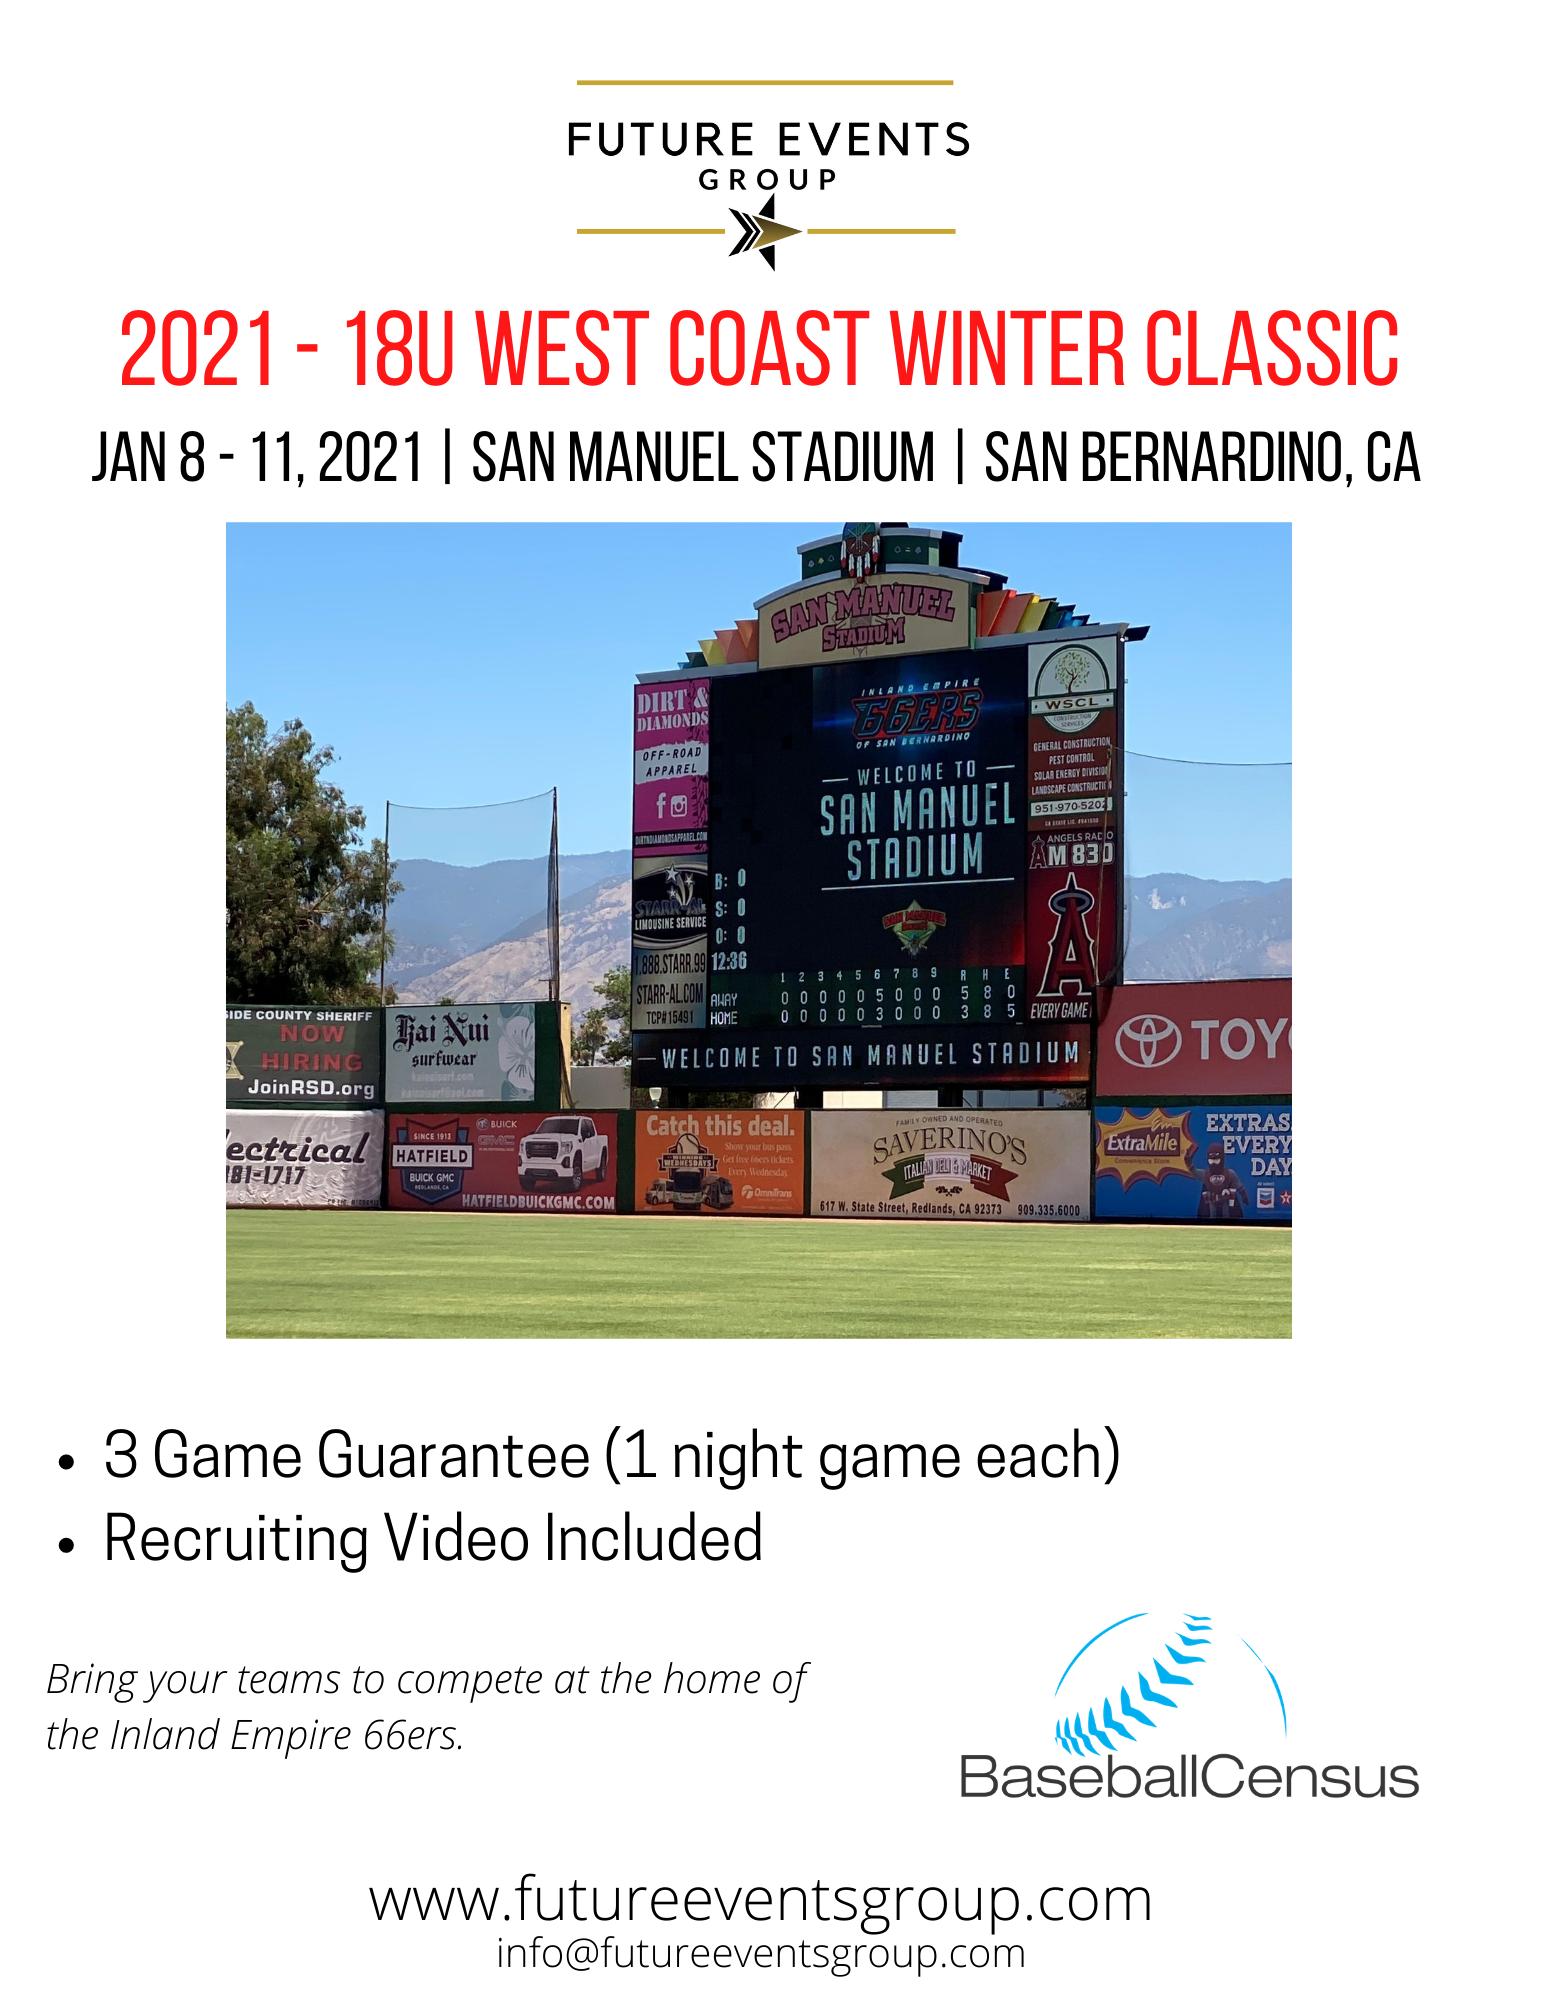 2021 West Coast Winter Classic - 18U Tournament